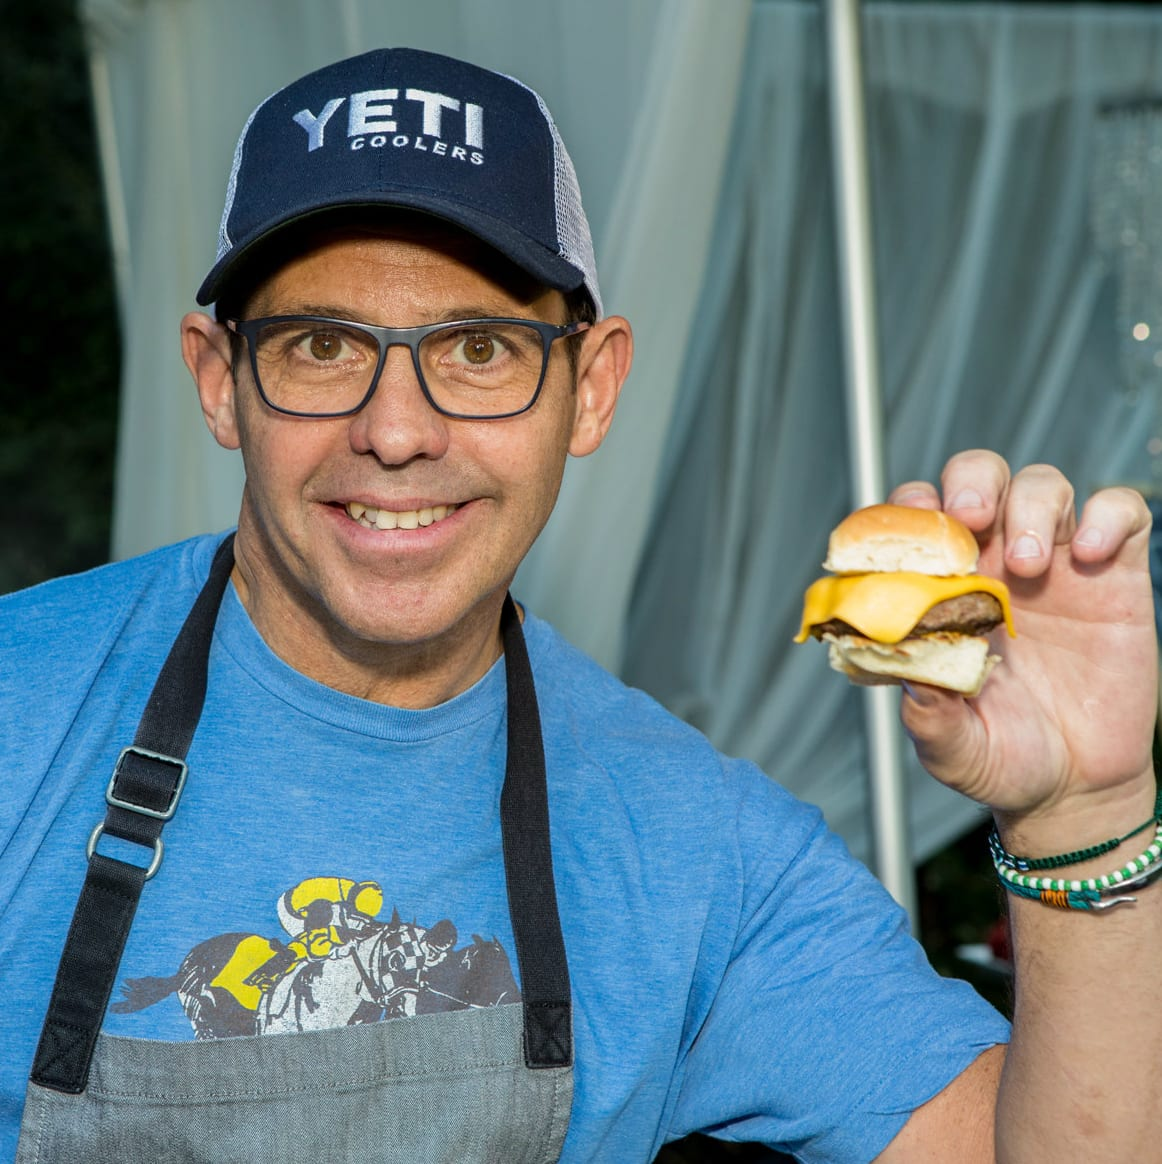 Chef John Tesar, Knife